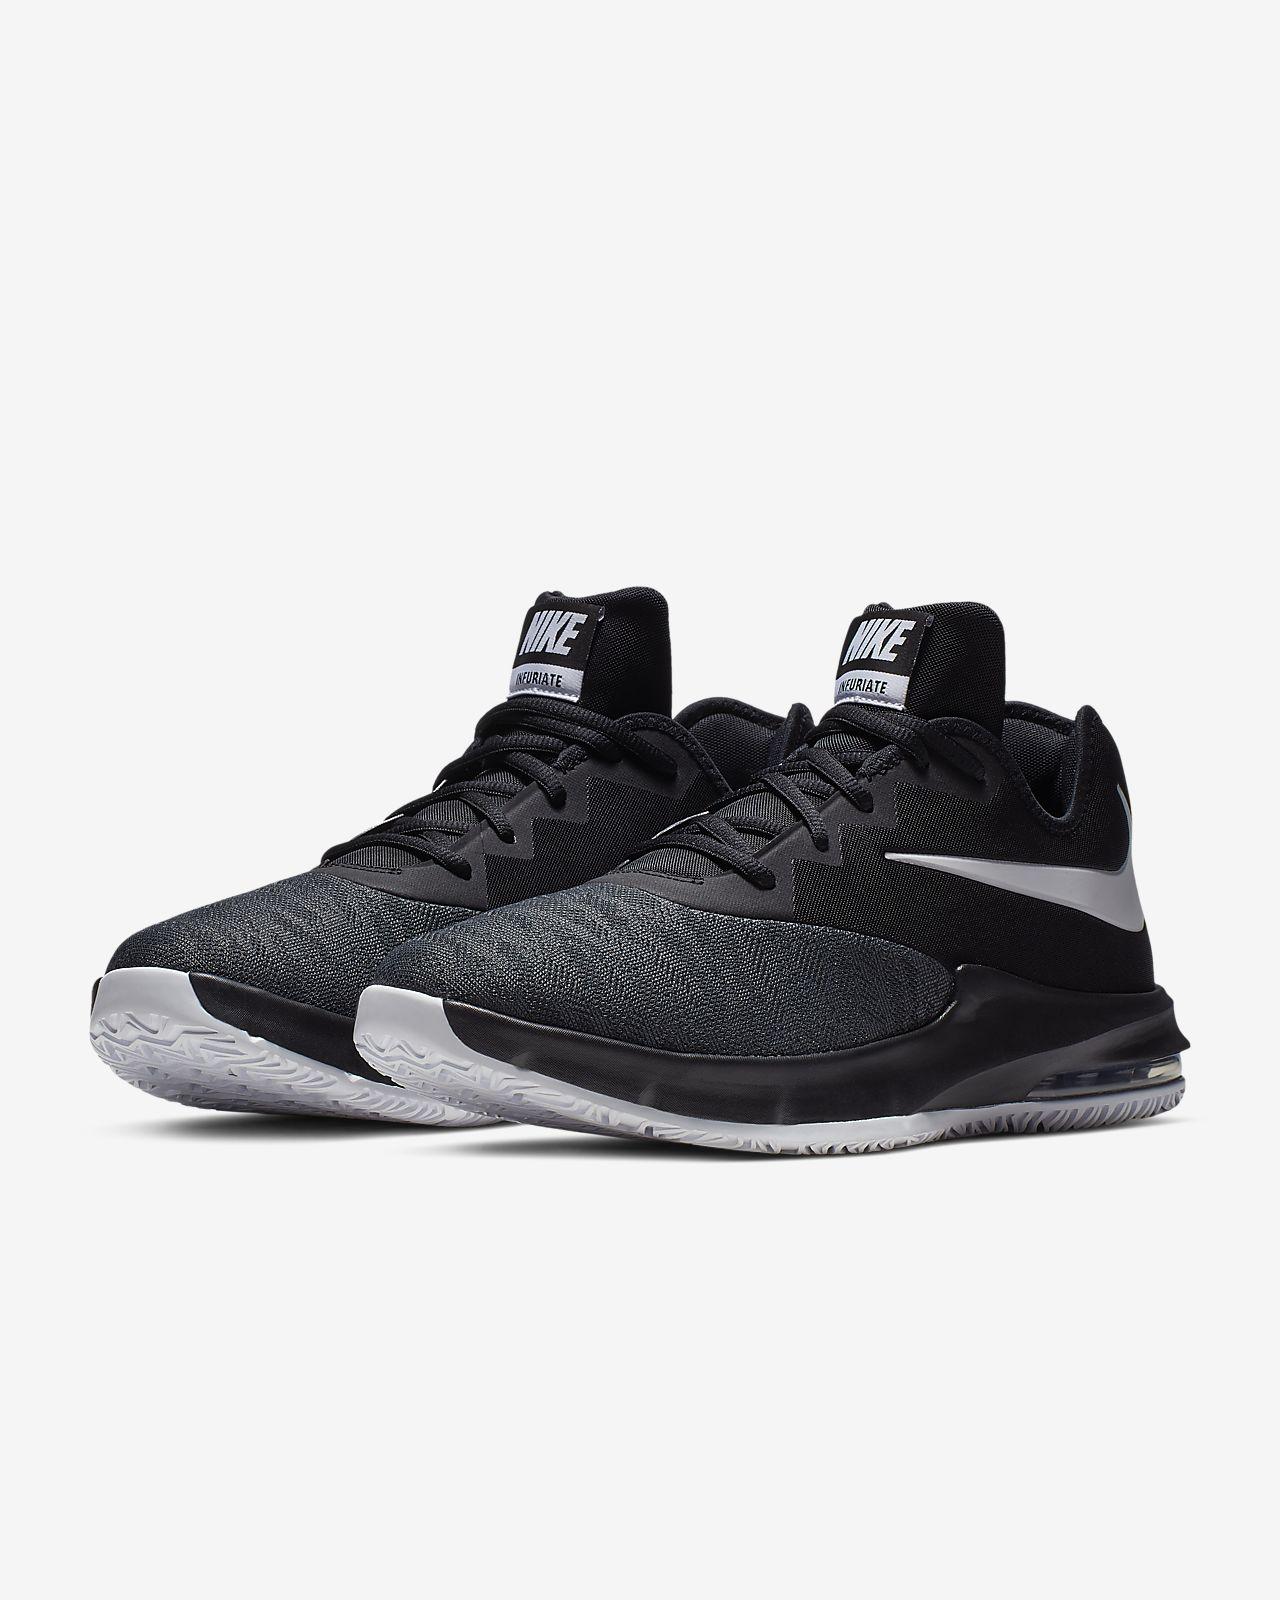 pretty nice 2fcee 4e870 ... Nike Air Max Infuriate III Low Men s Basketball Shoe